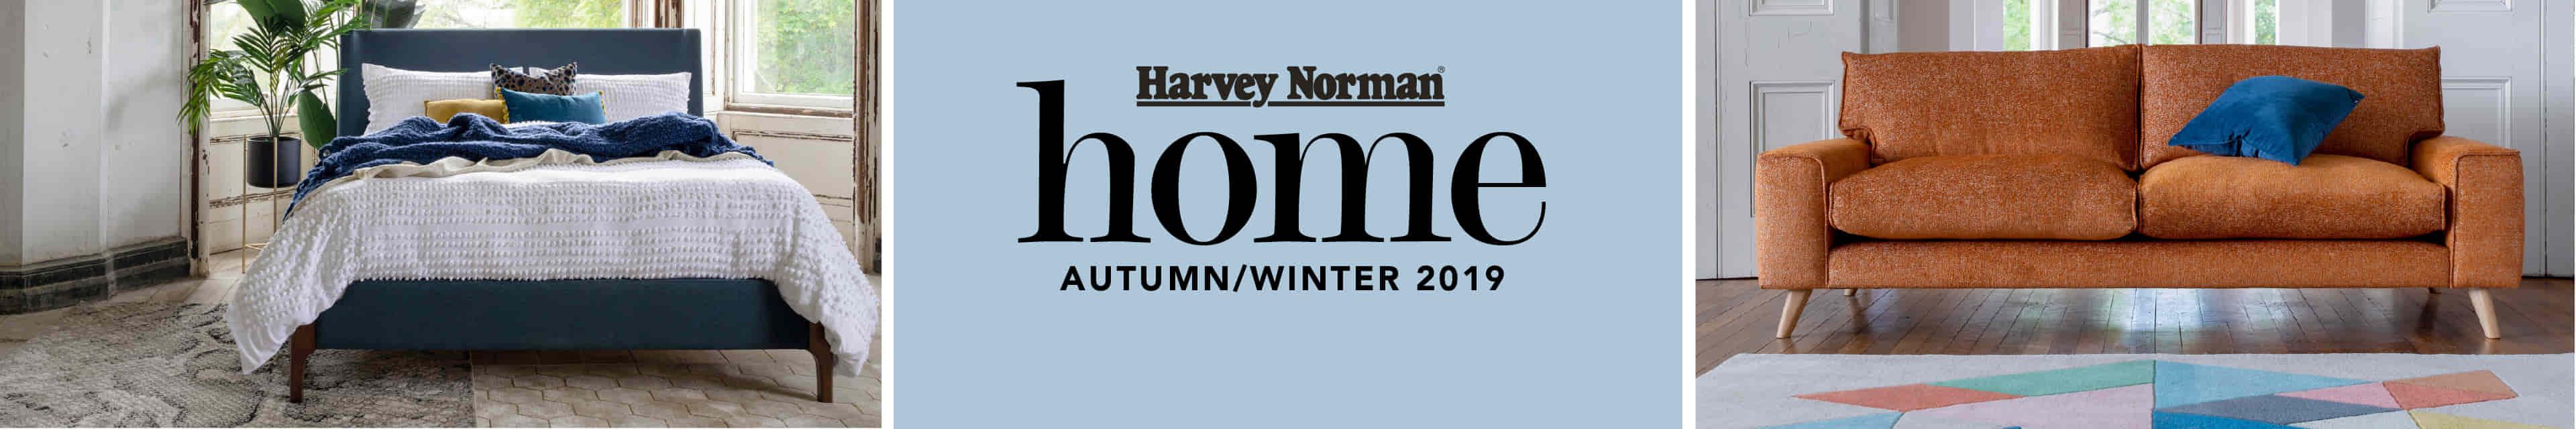 Home Harvey Norman Ireland